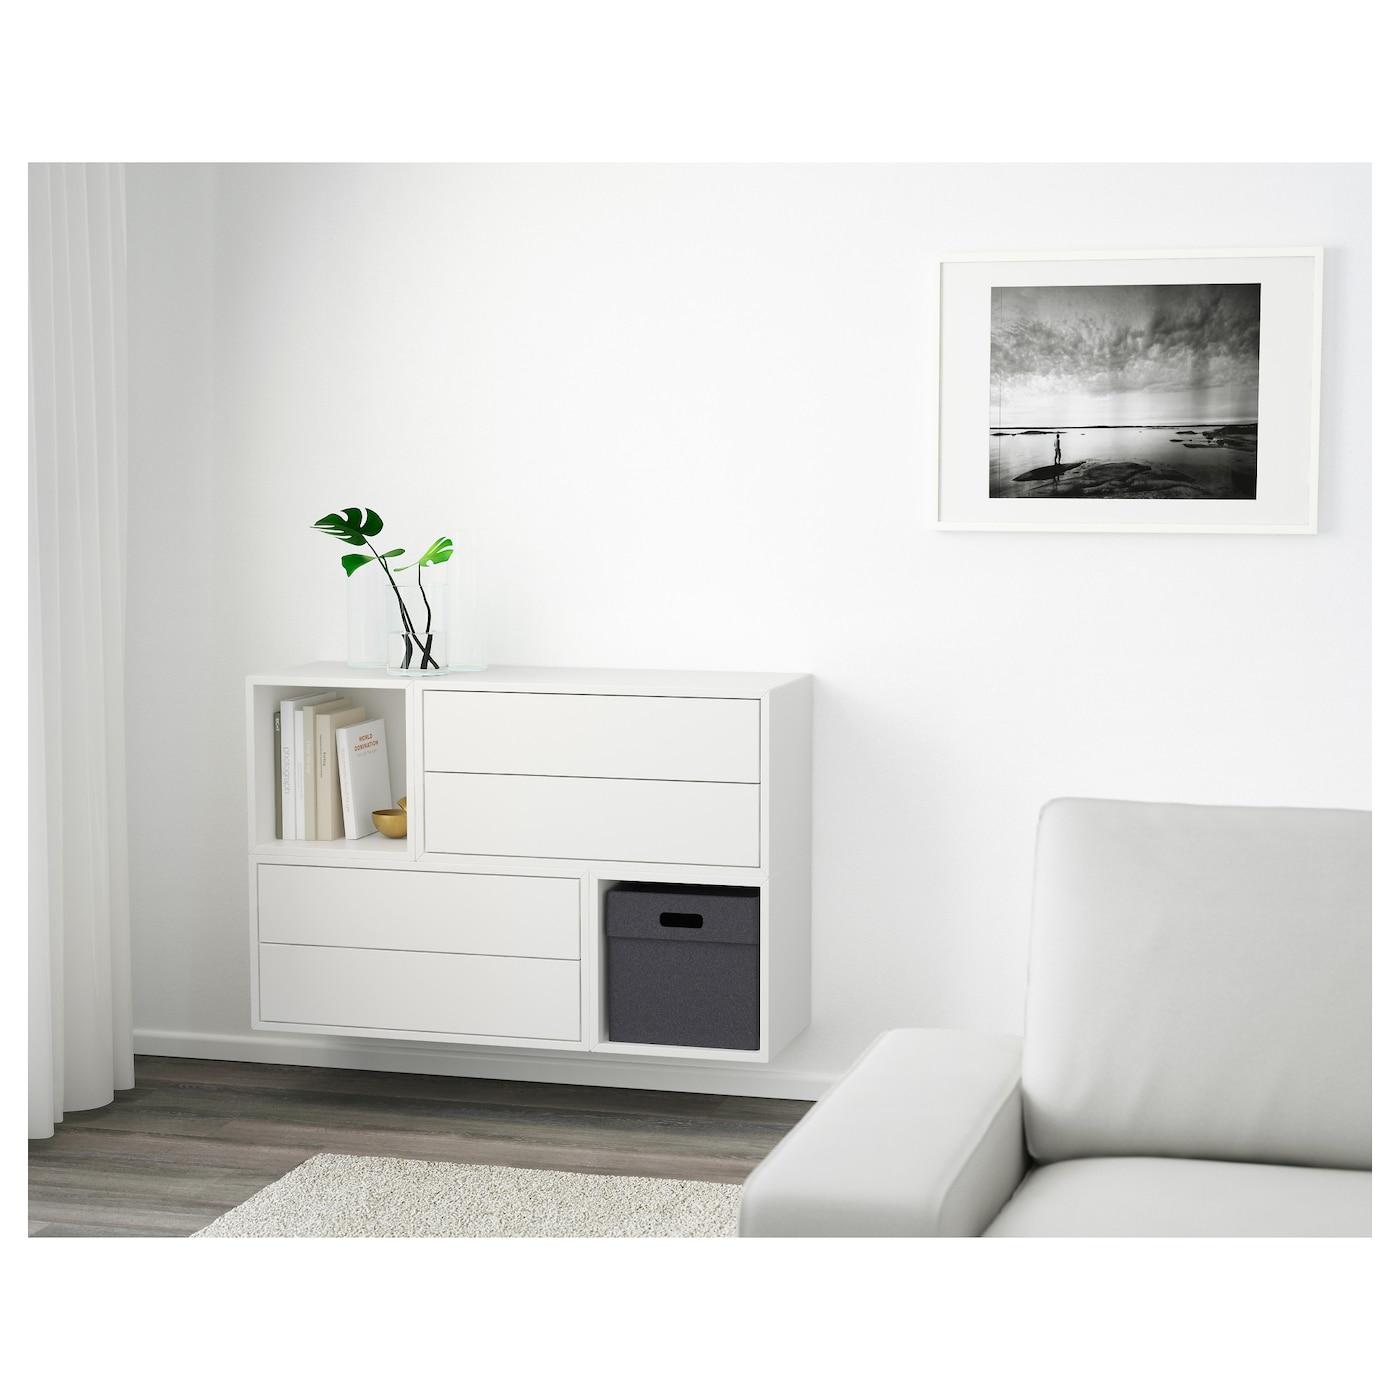 Eket Wall Mounted Cabinet Combination White 105 X 35 X 70